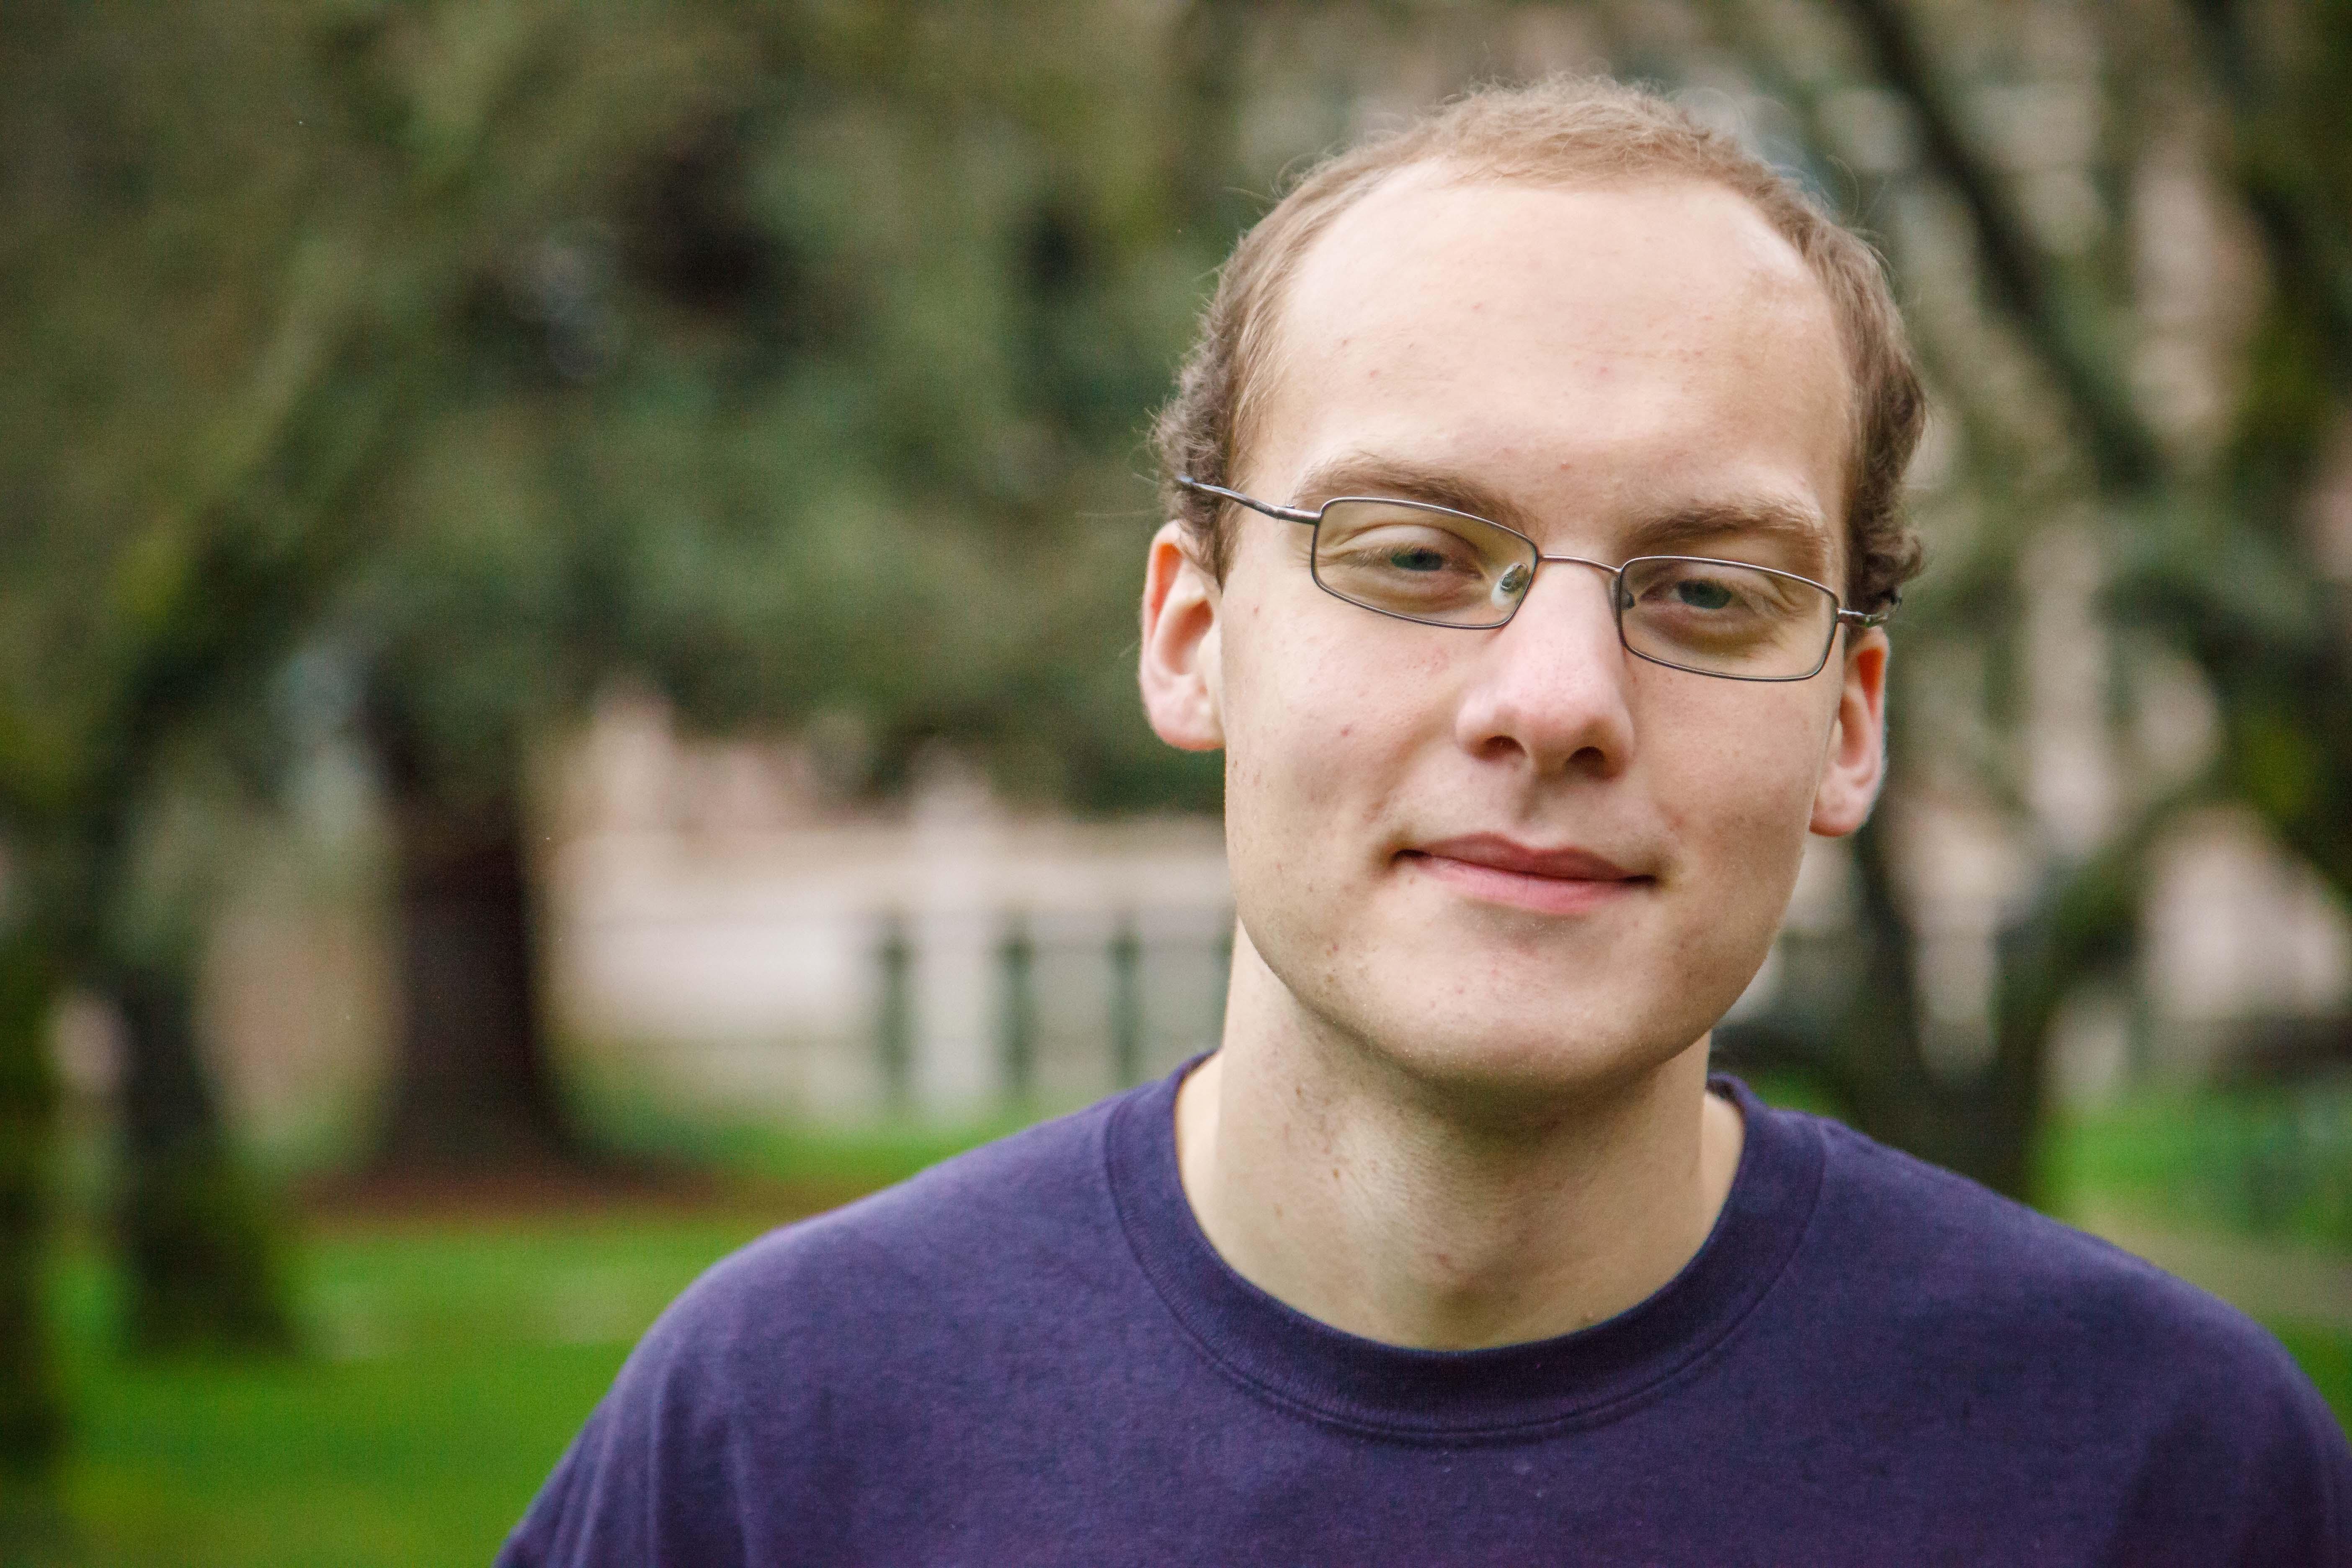 Caleb Huffman